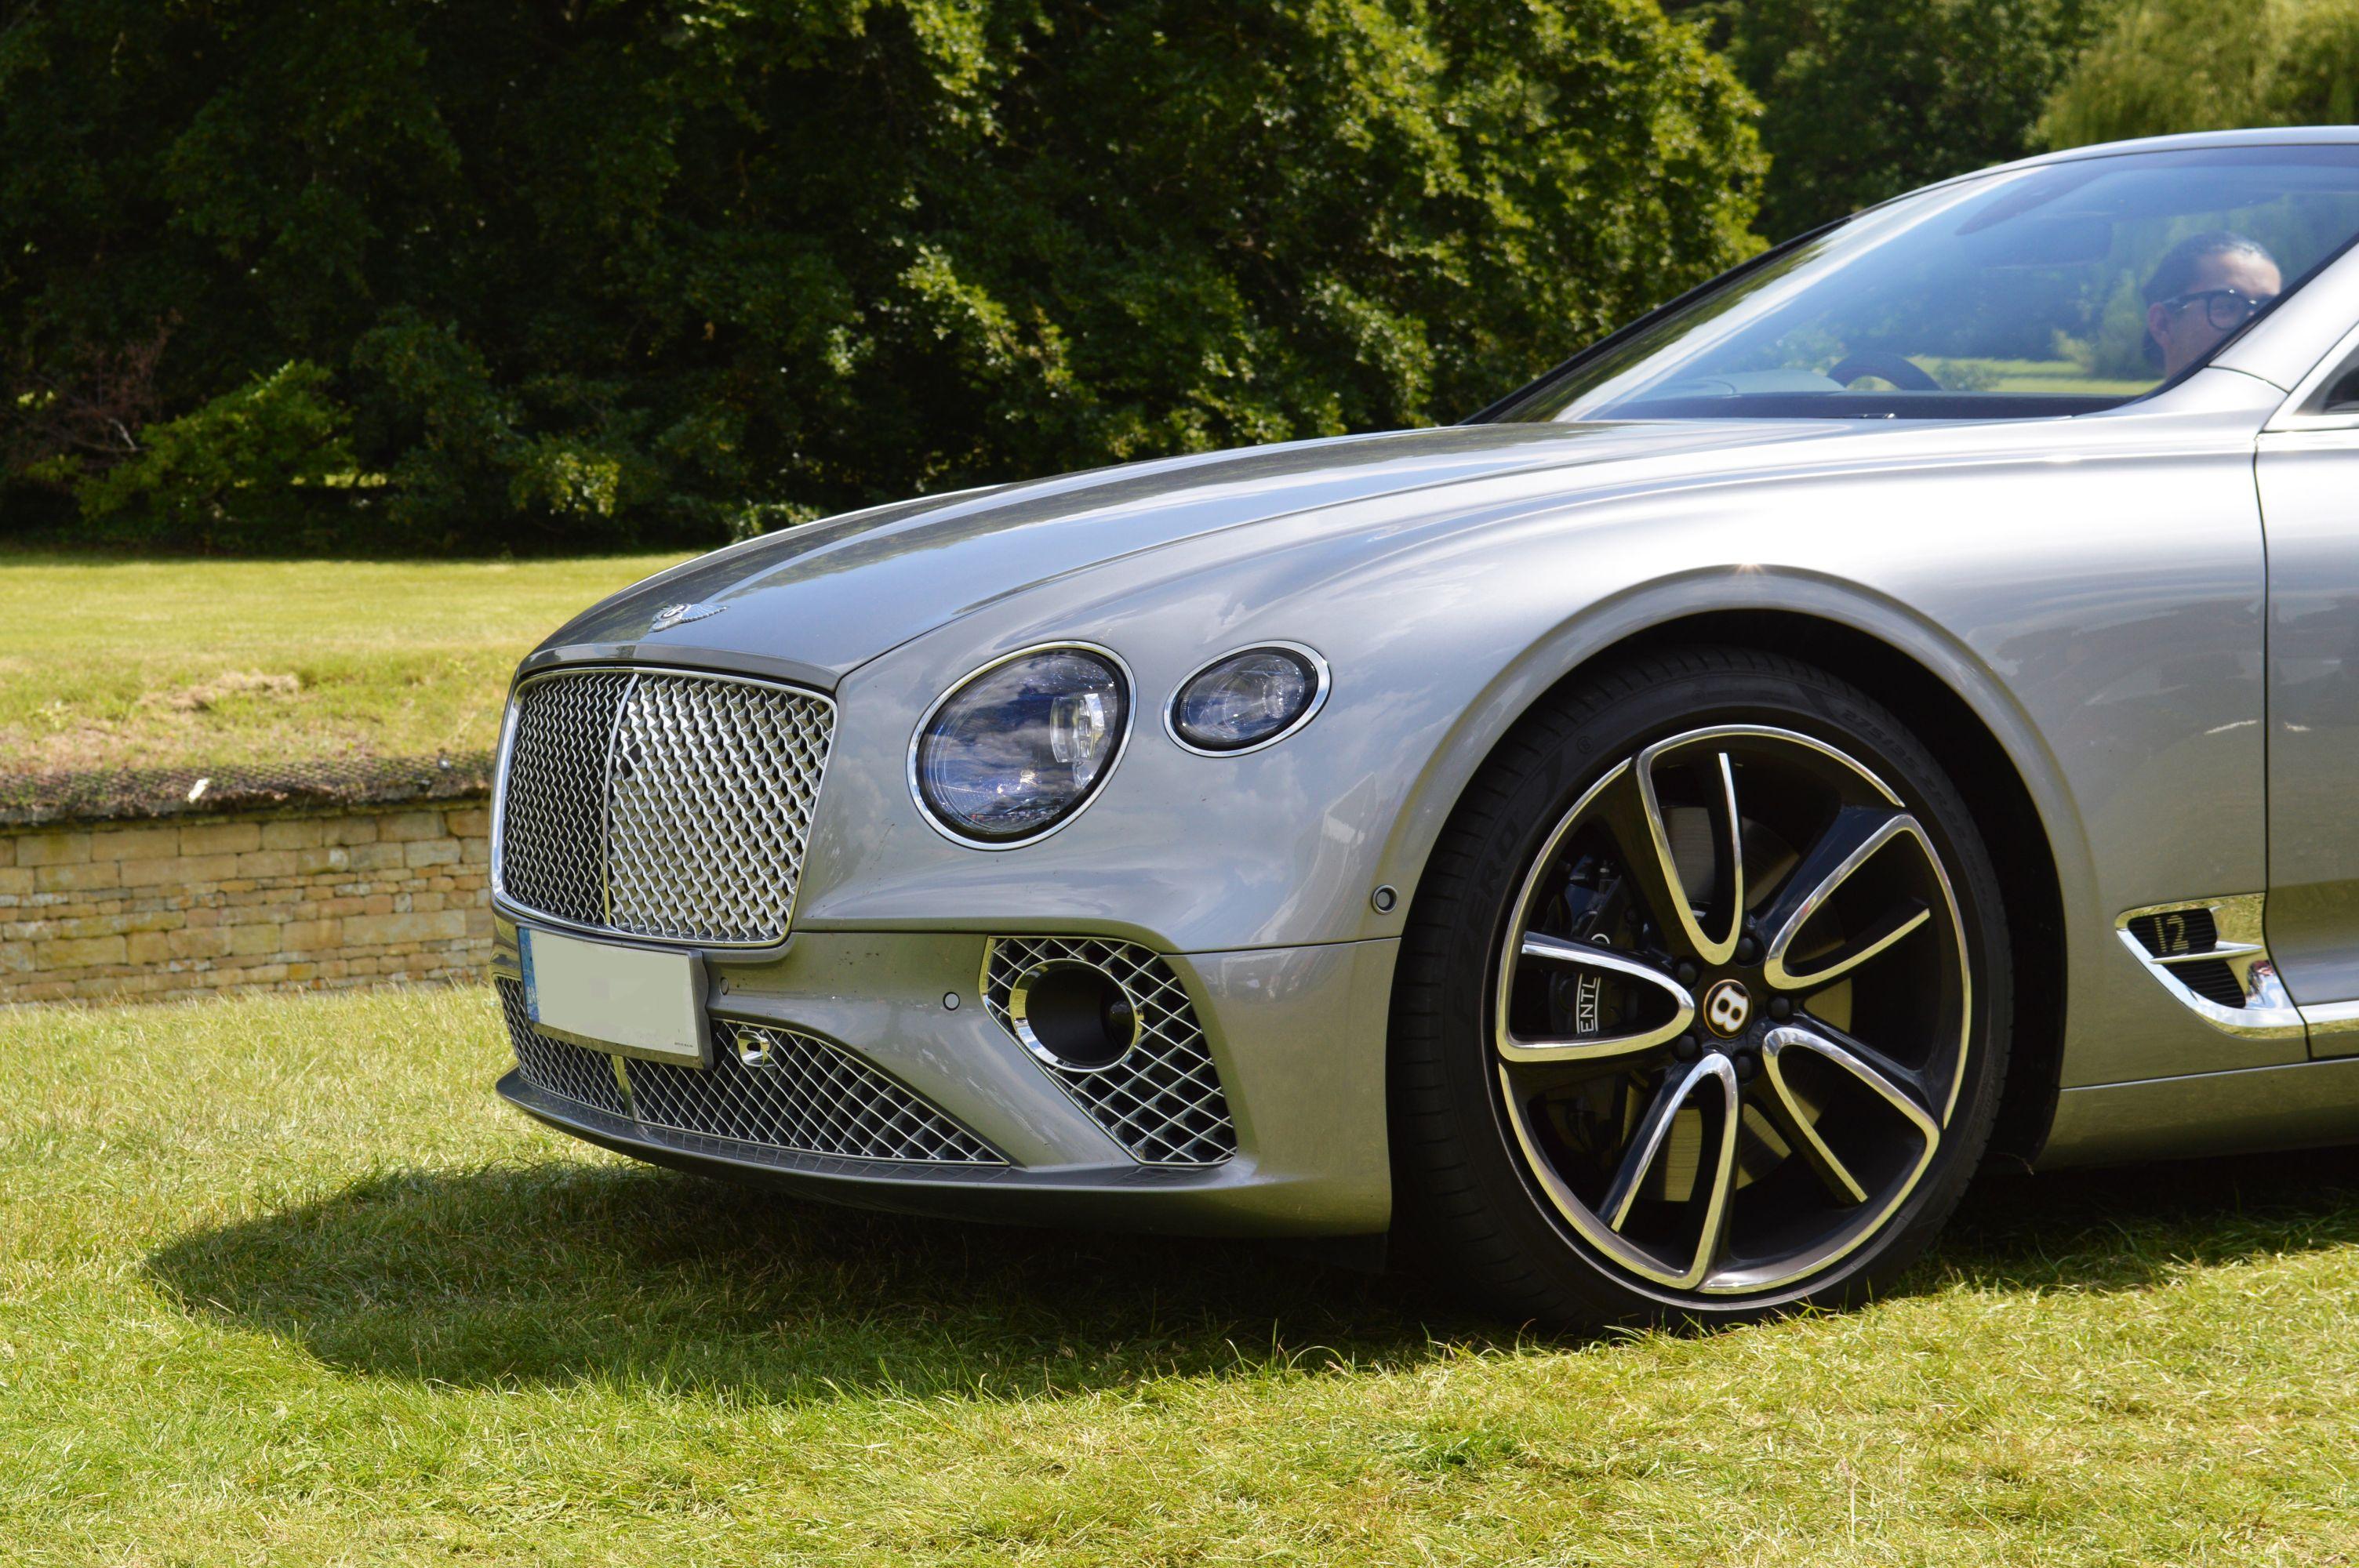 Bentley Continental GT, GTC & Flying Spur Wheel & Tyre Assemblies (2018 on)